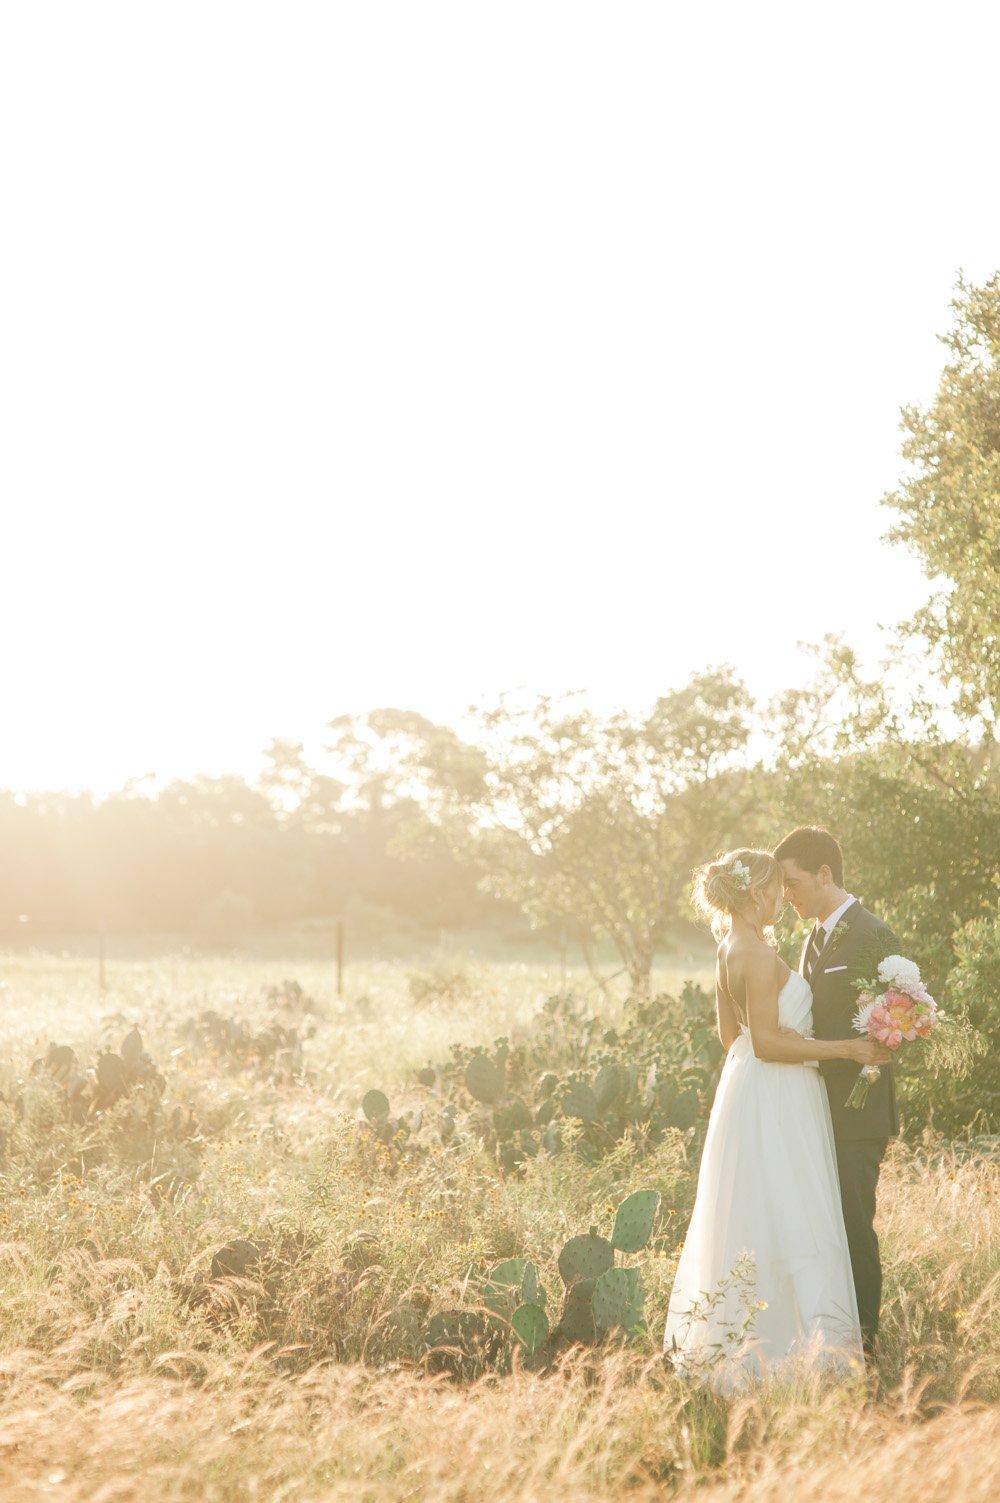 sunset portraits in a field, romantic wedding photography, modern wedding photographer in austin texas